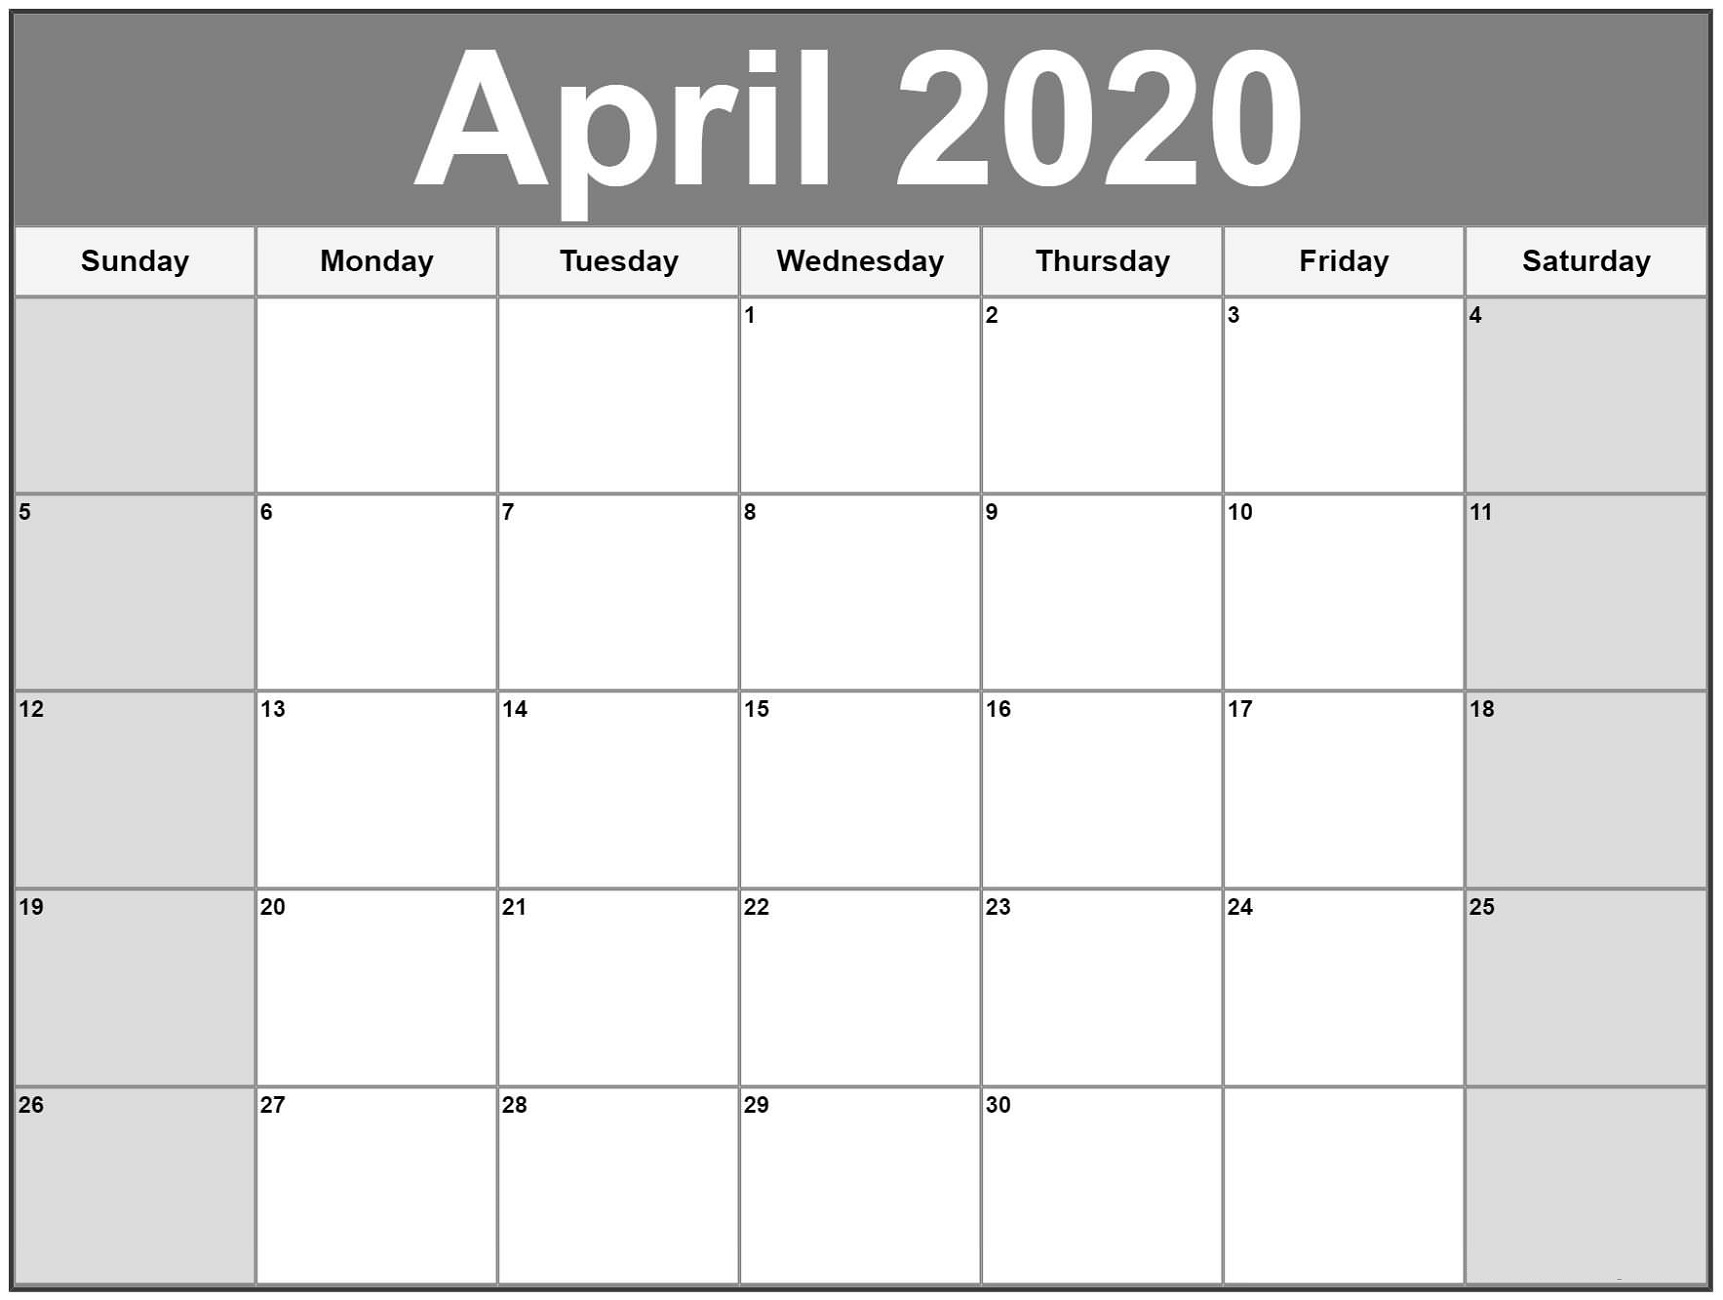 Free Printable Calendar 2020 | Calendar Shelter regarding Free Fill In Calendars 2020